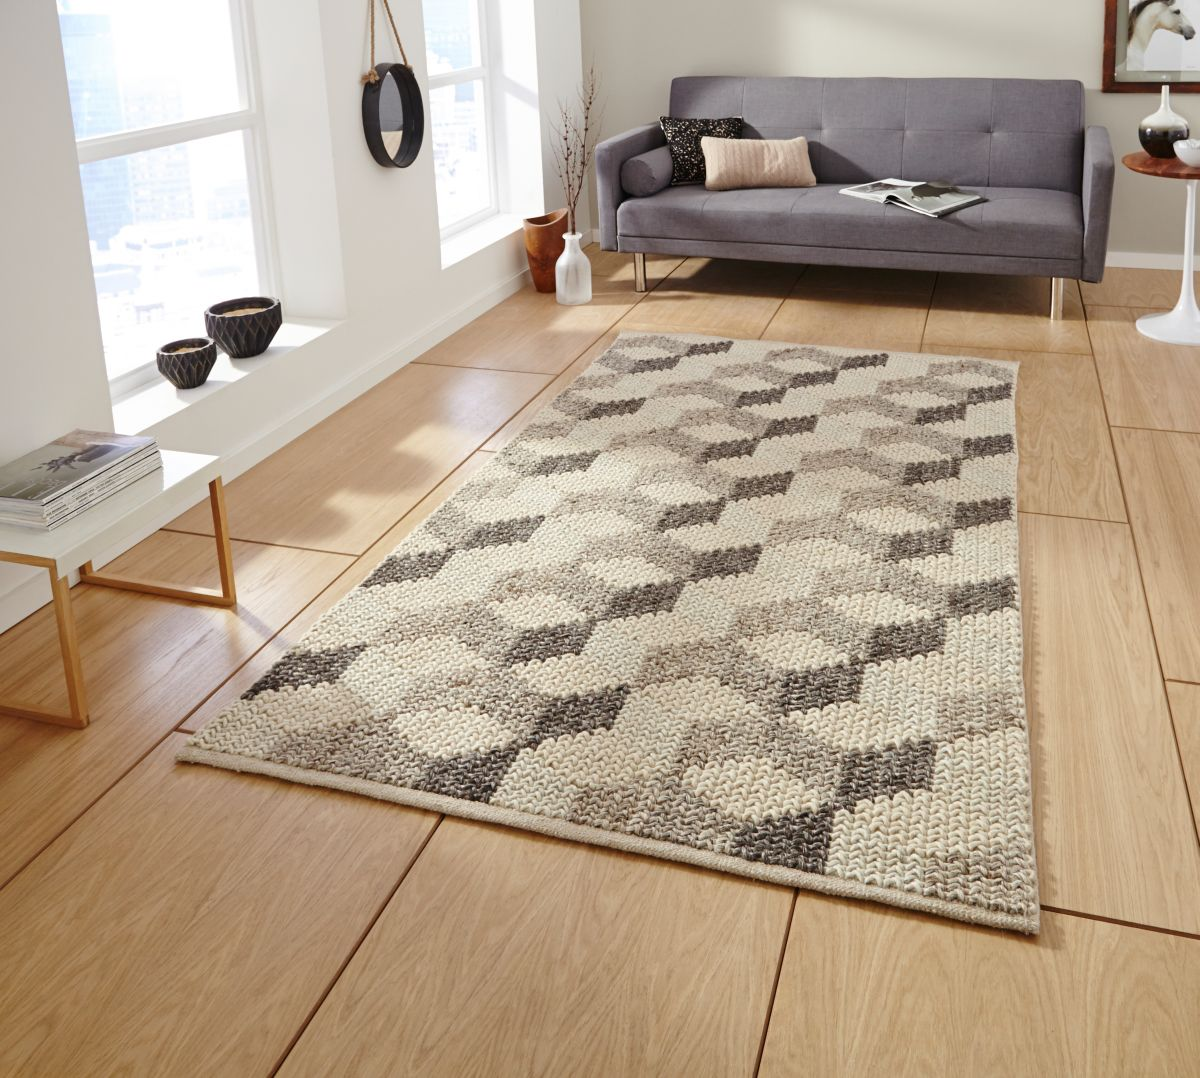 14therugseller.co_.uk_alpha-3d-effect-wool-rug-in-natural-beige.jpg